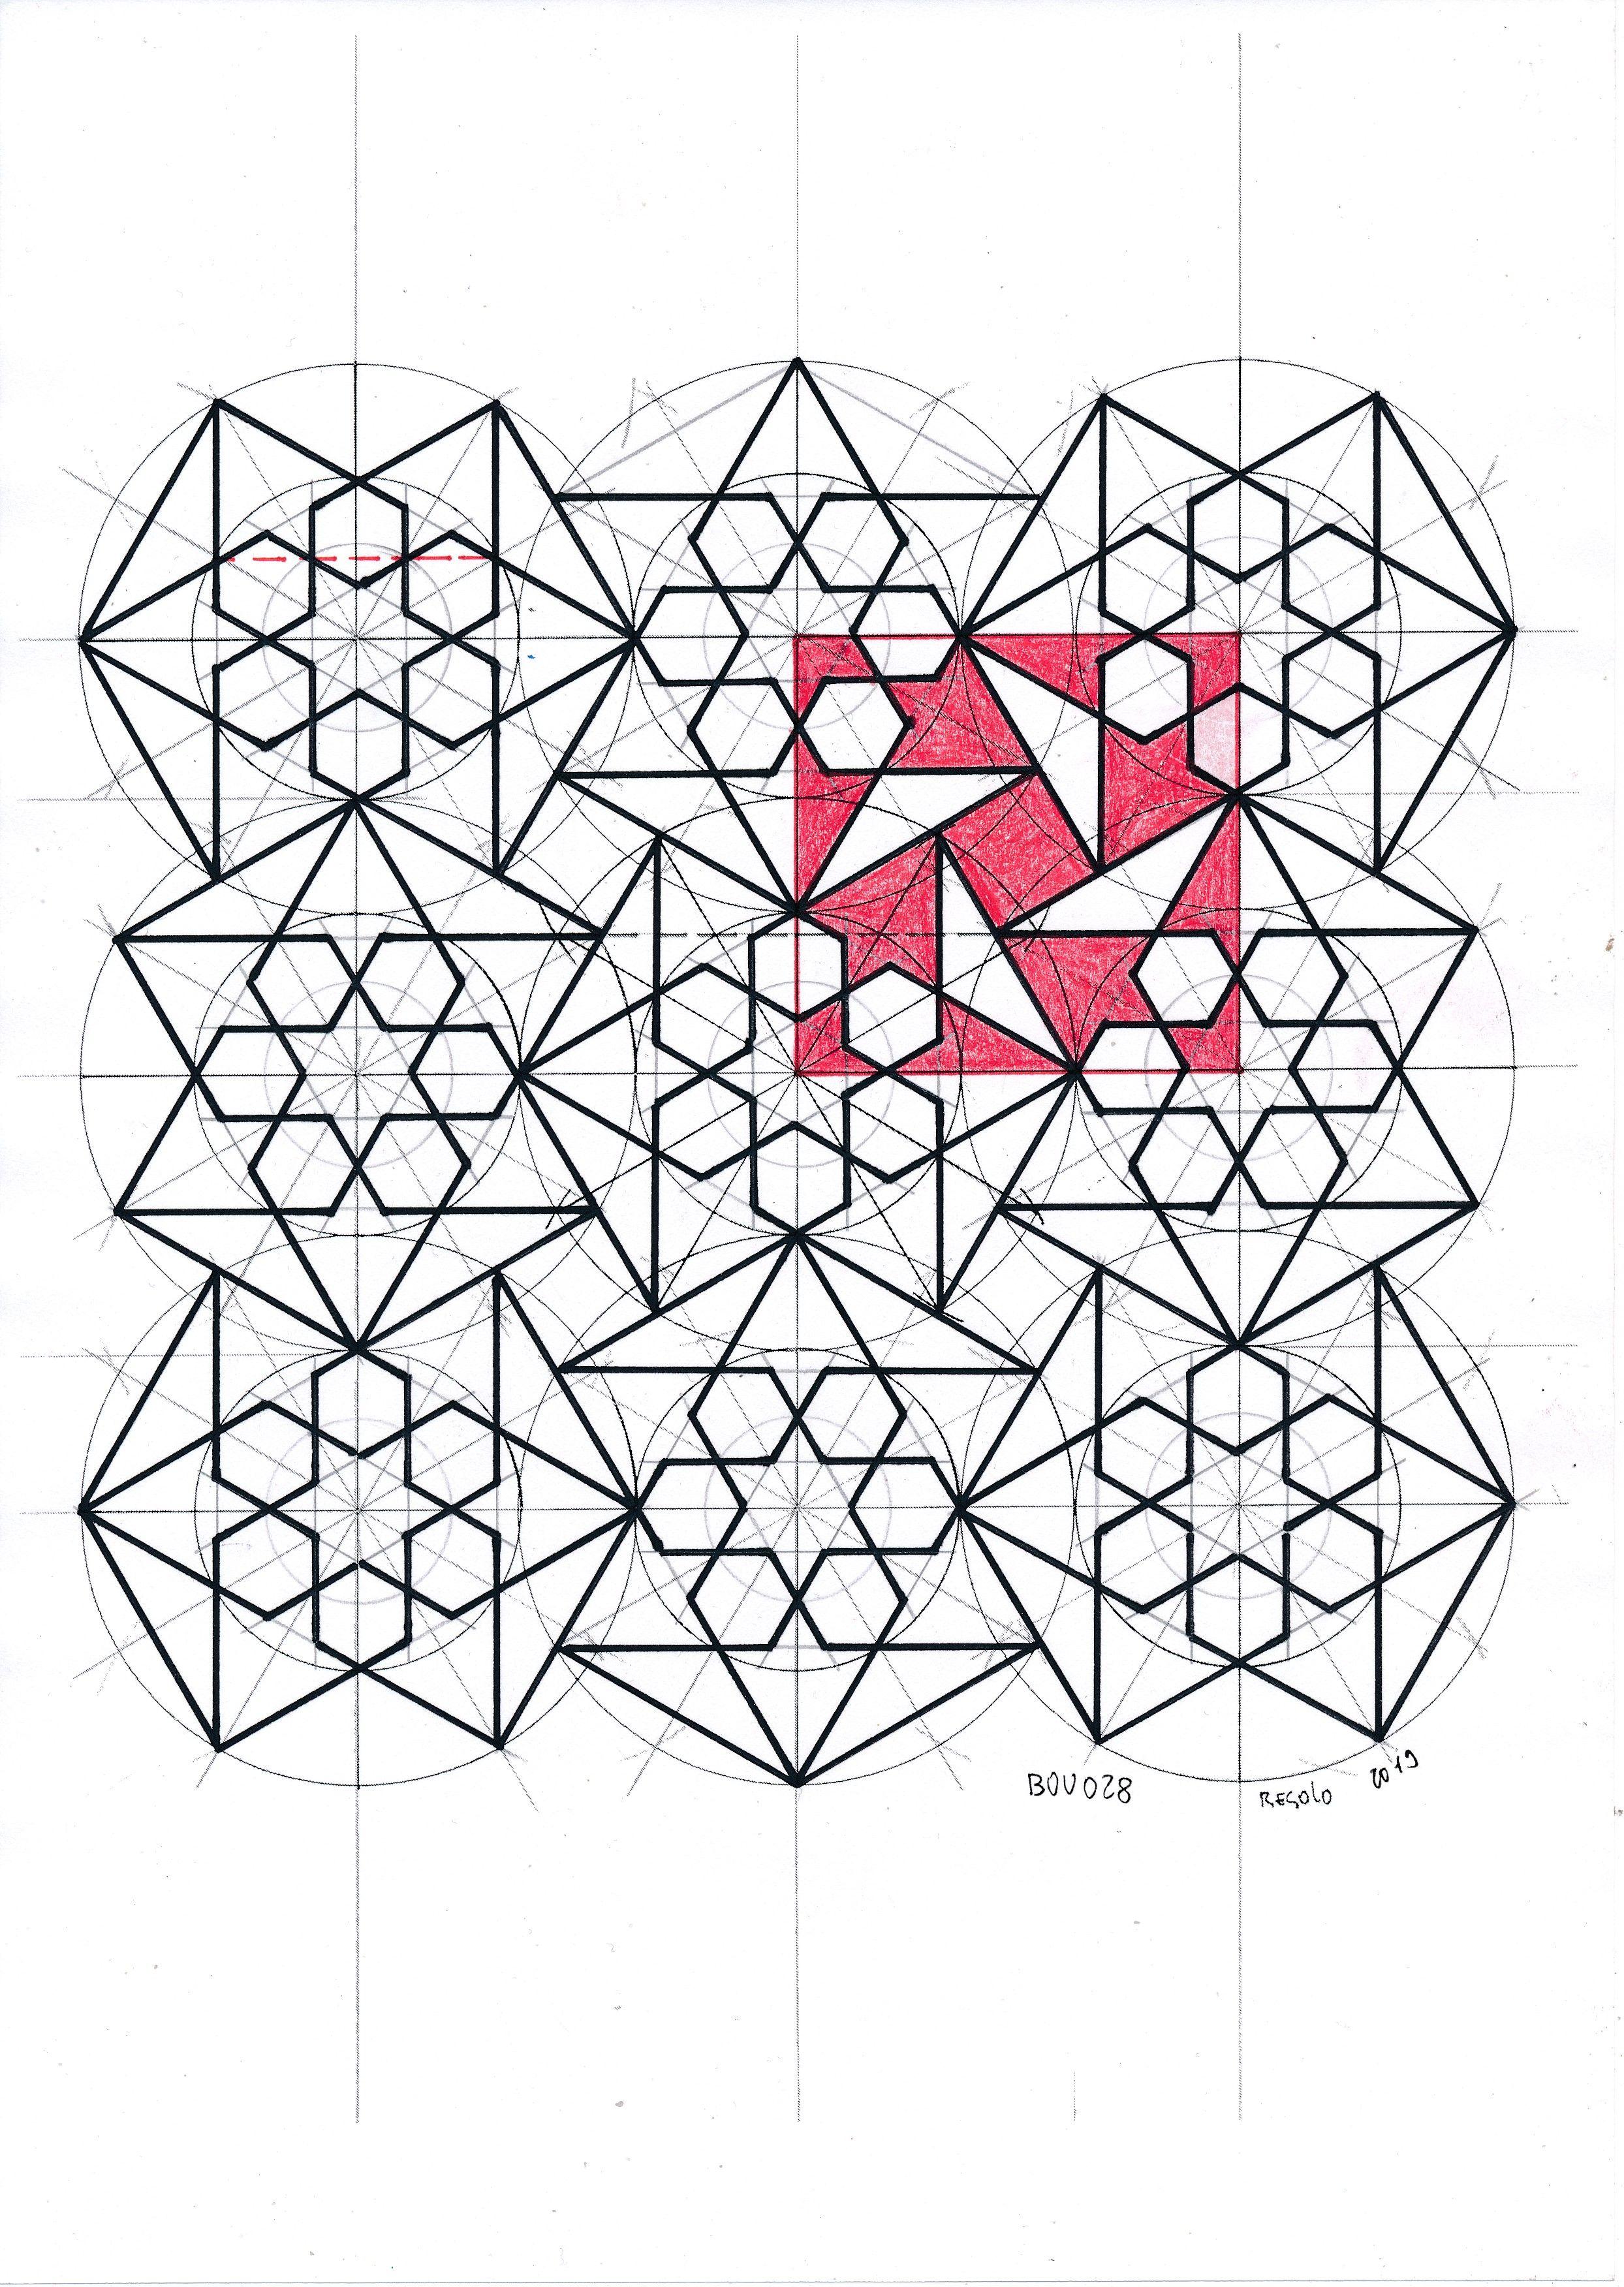 Bou028 Islamicart Islamicdesign Islamicgeometry Bourgoin Jaybonner Handmade Mathart Regolo54 Geometric Drawing Islamic Patterns Islamic Design Pattern